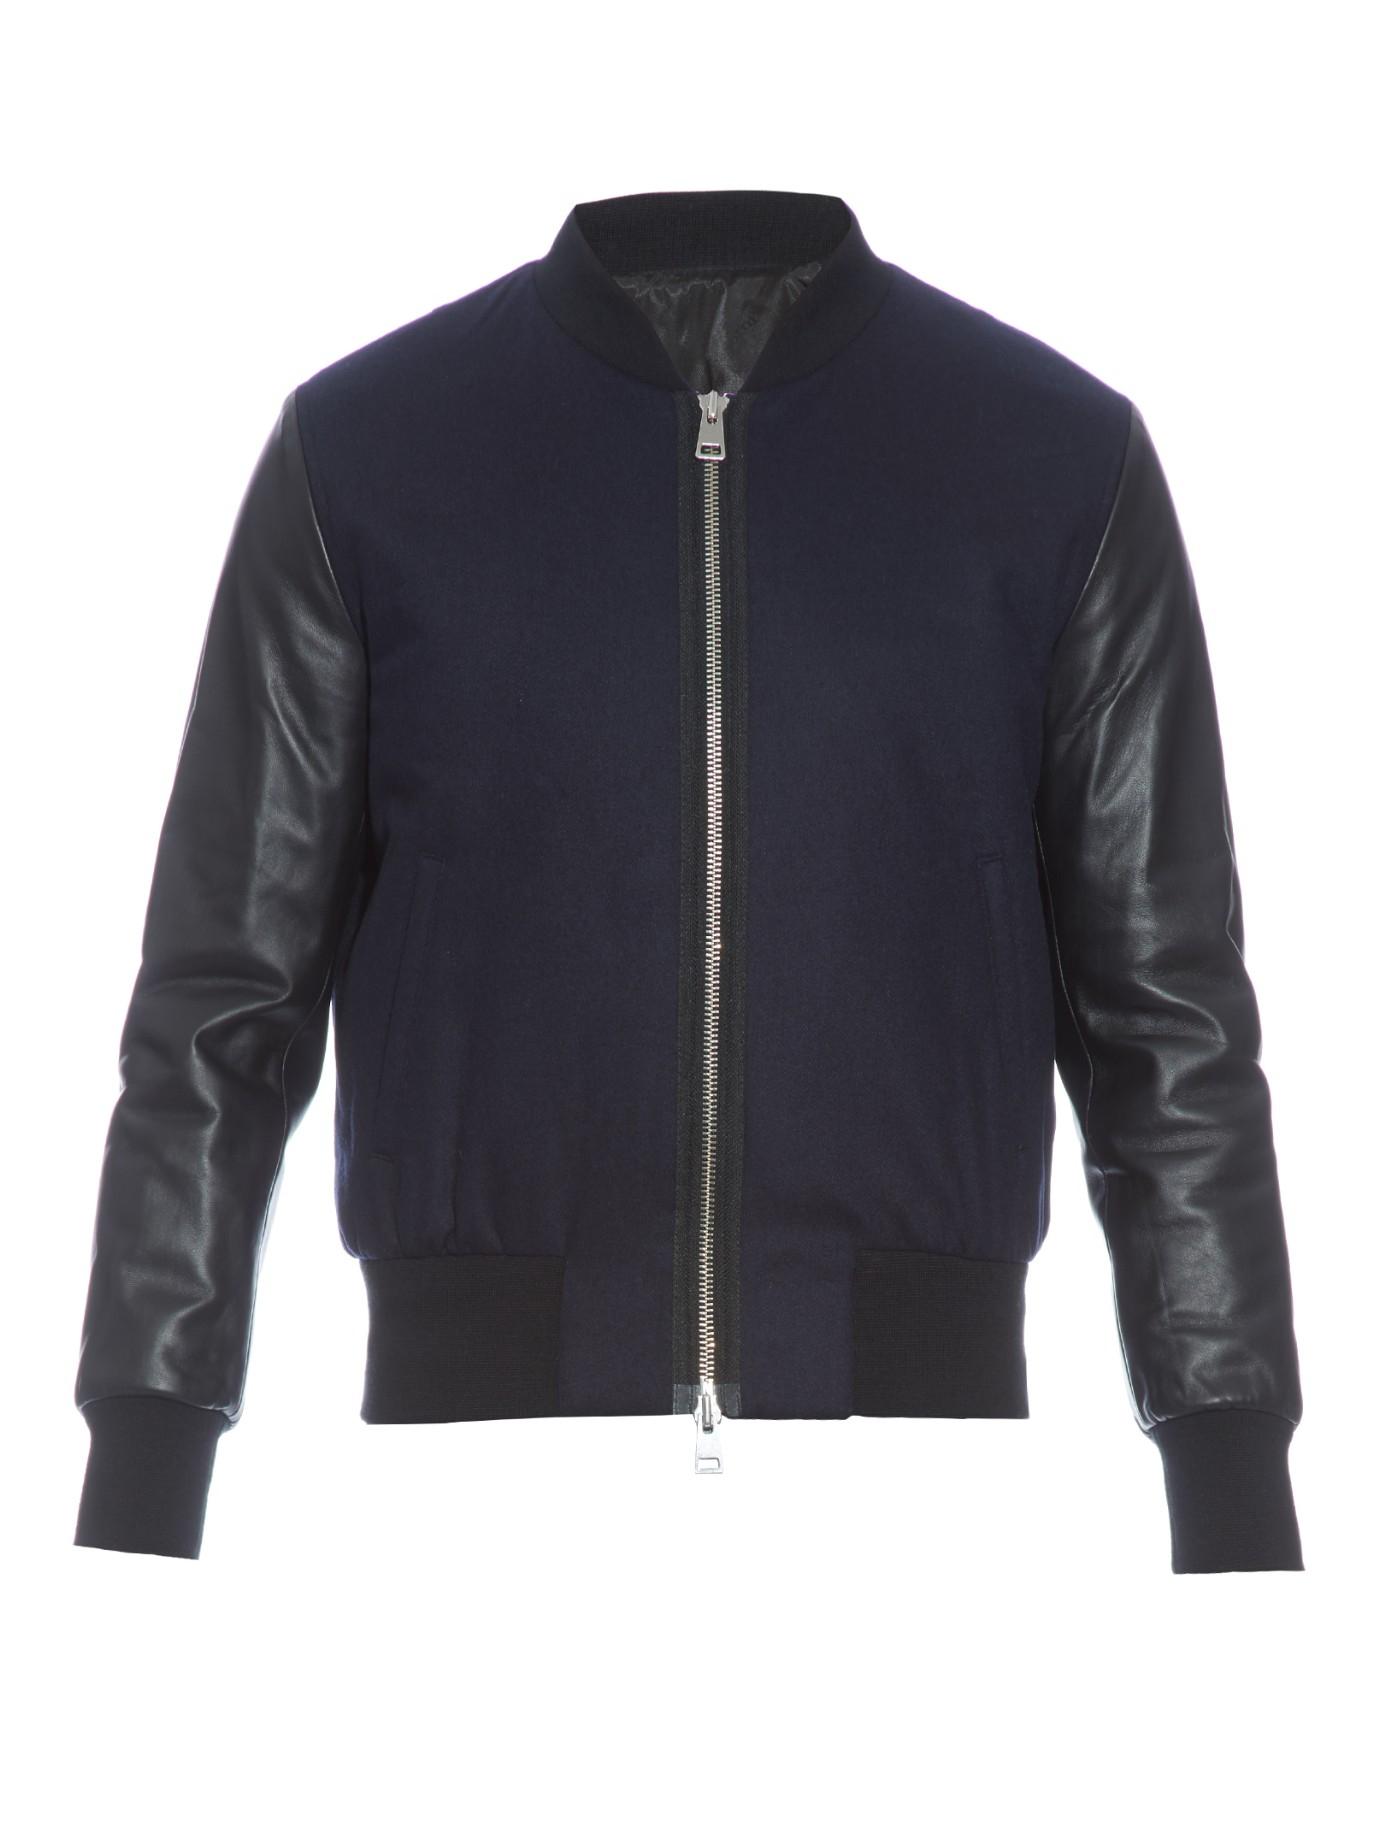 Cheap Black Leather Jacket